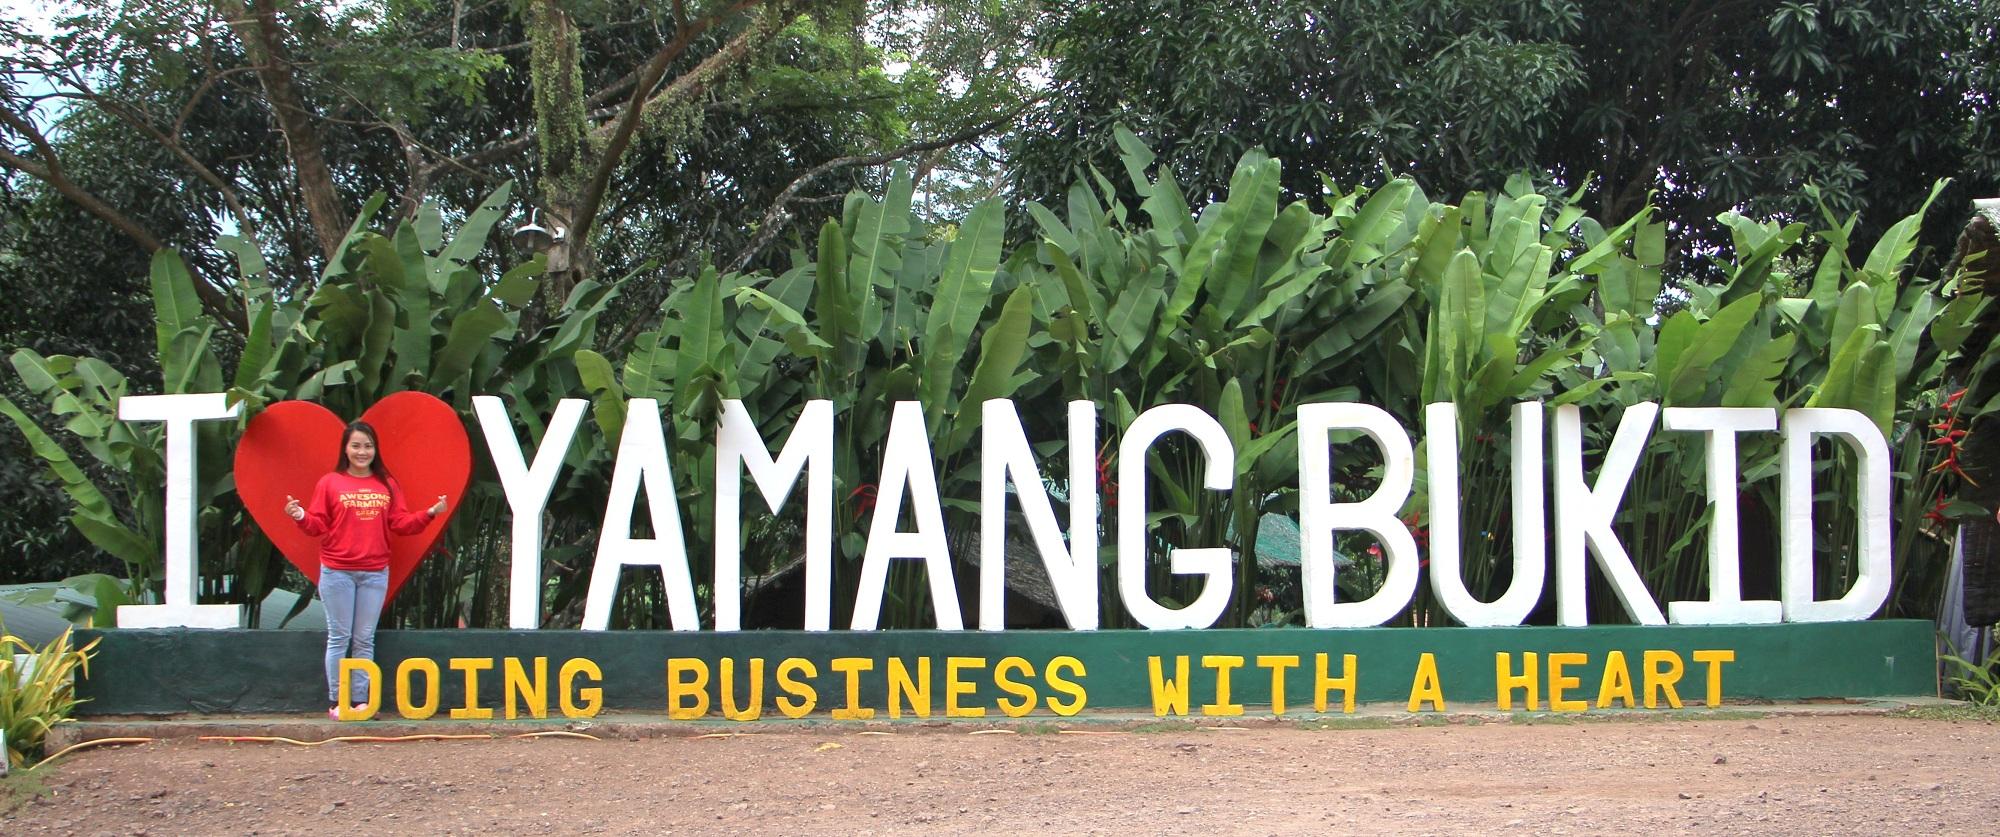 DOT nominates Yamang Bukid for farm tourism award